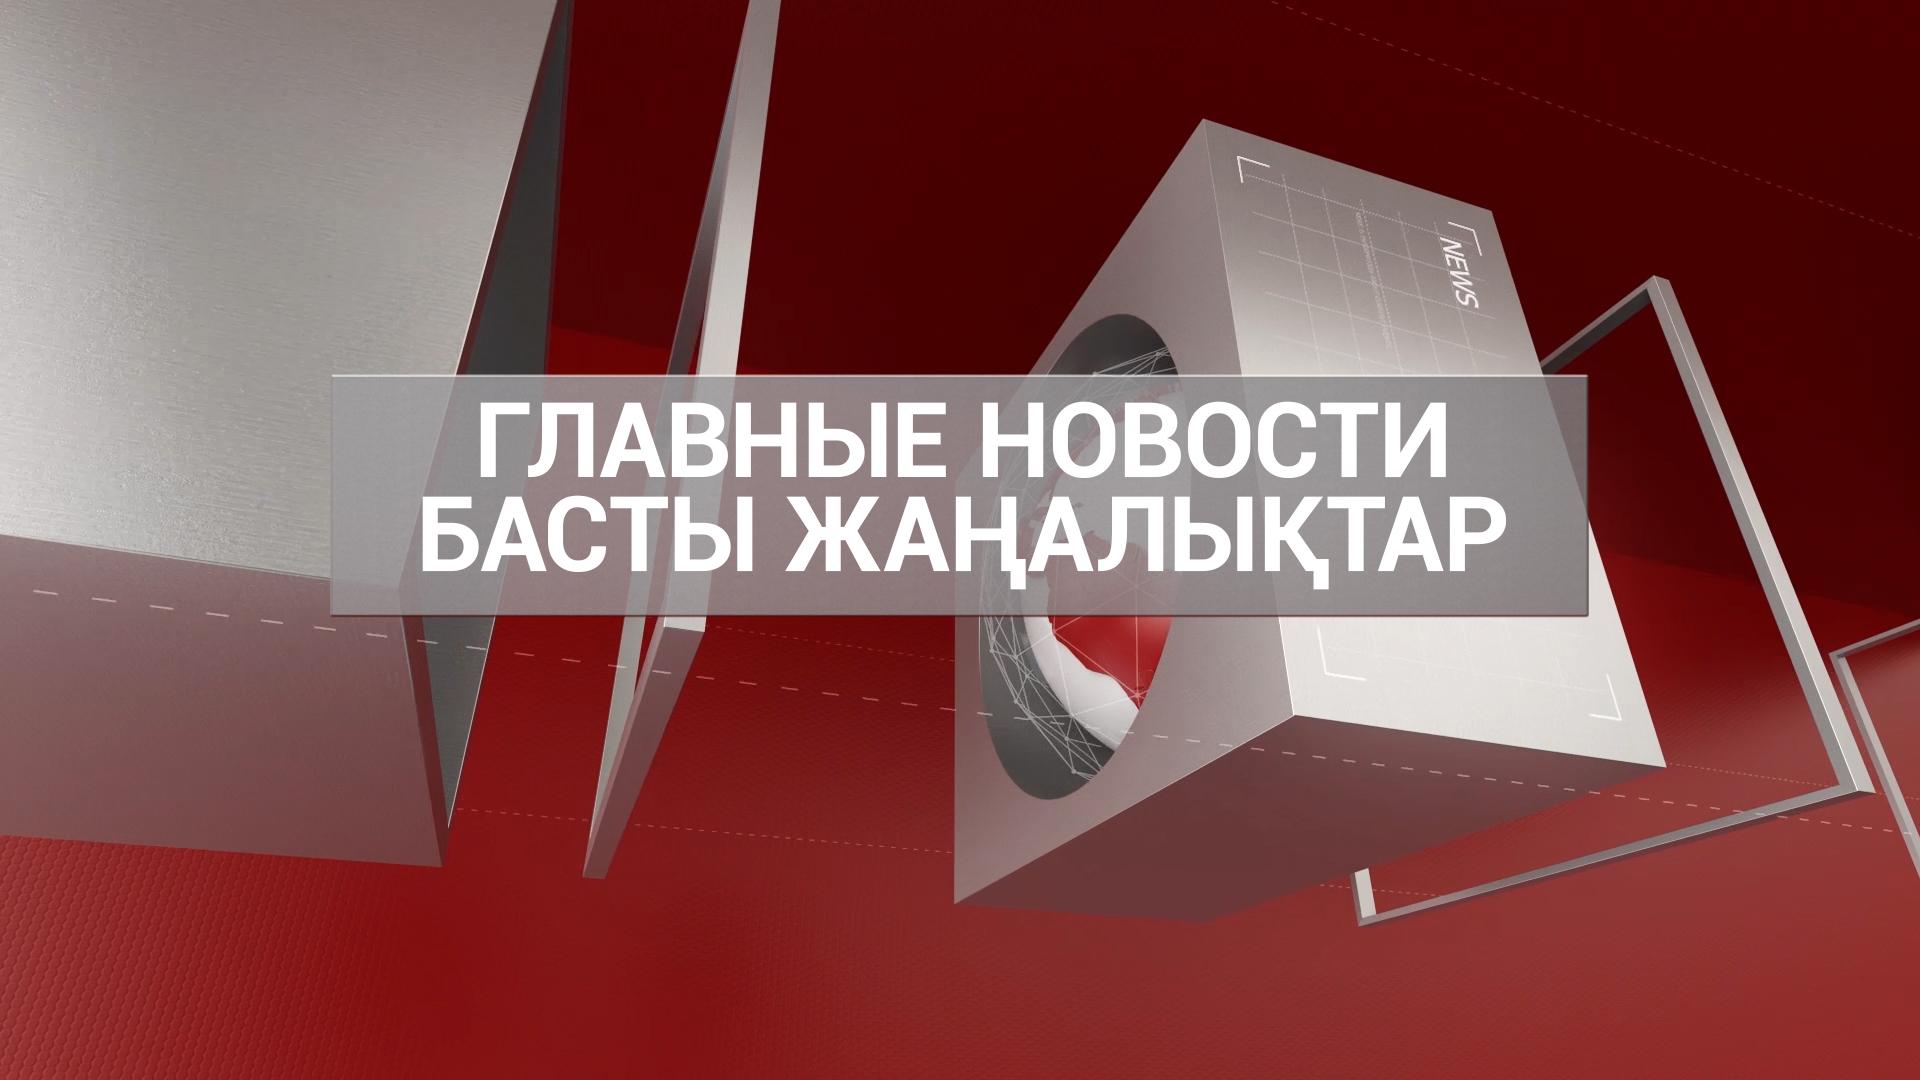 https://inbusiness.kz/ru/images/original/25/images/lsYZ3ARj.jpg